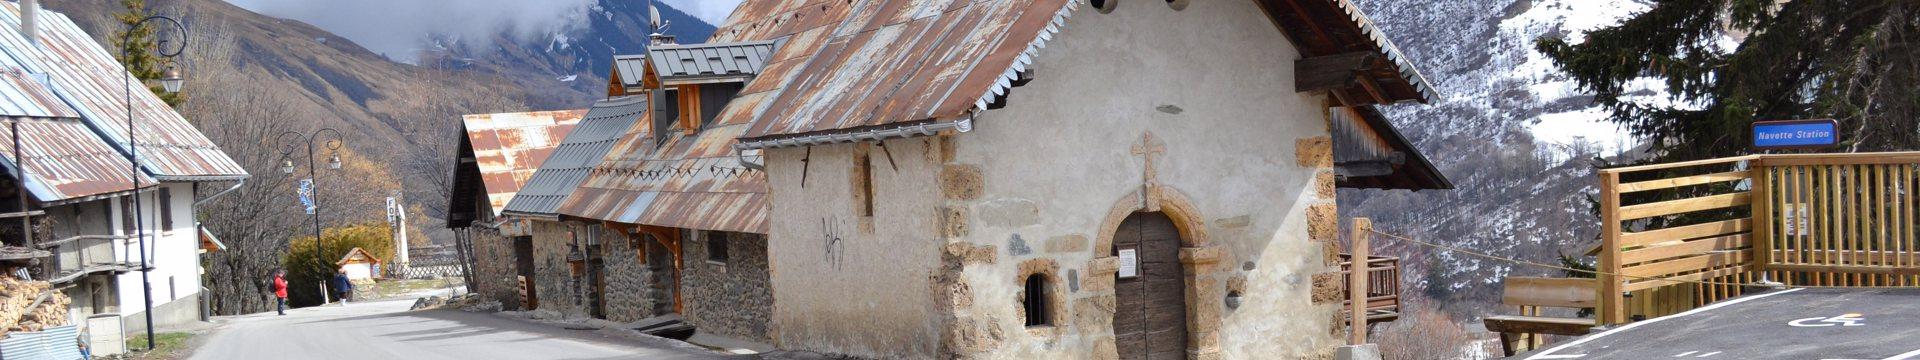 St. Jean d'Arves